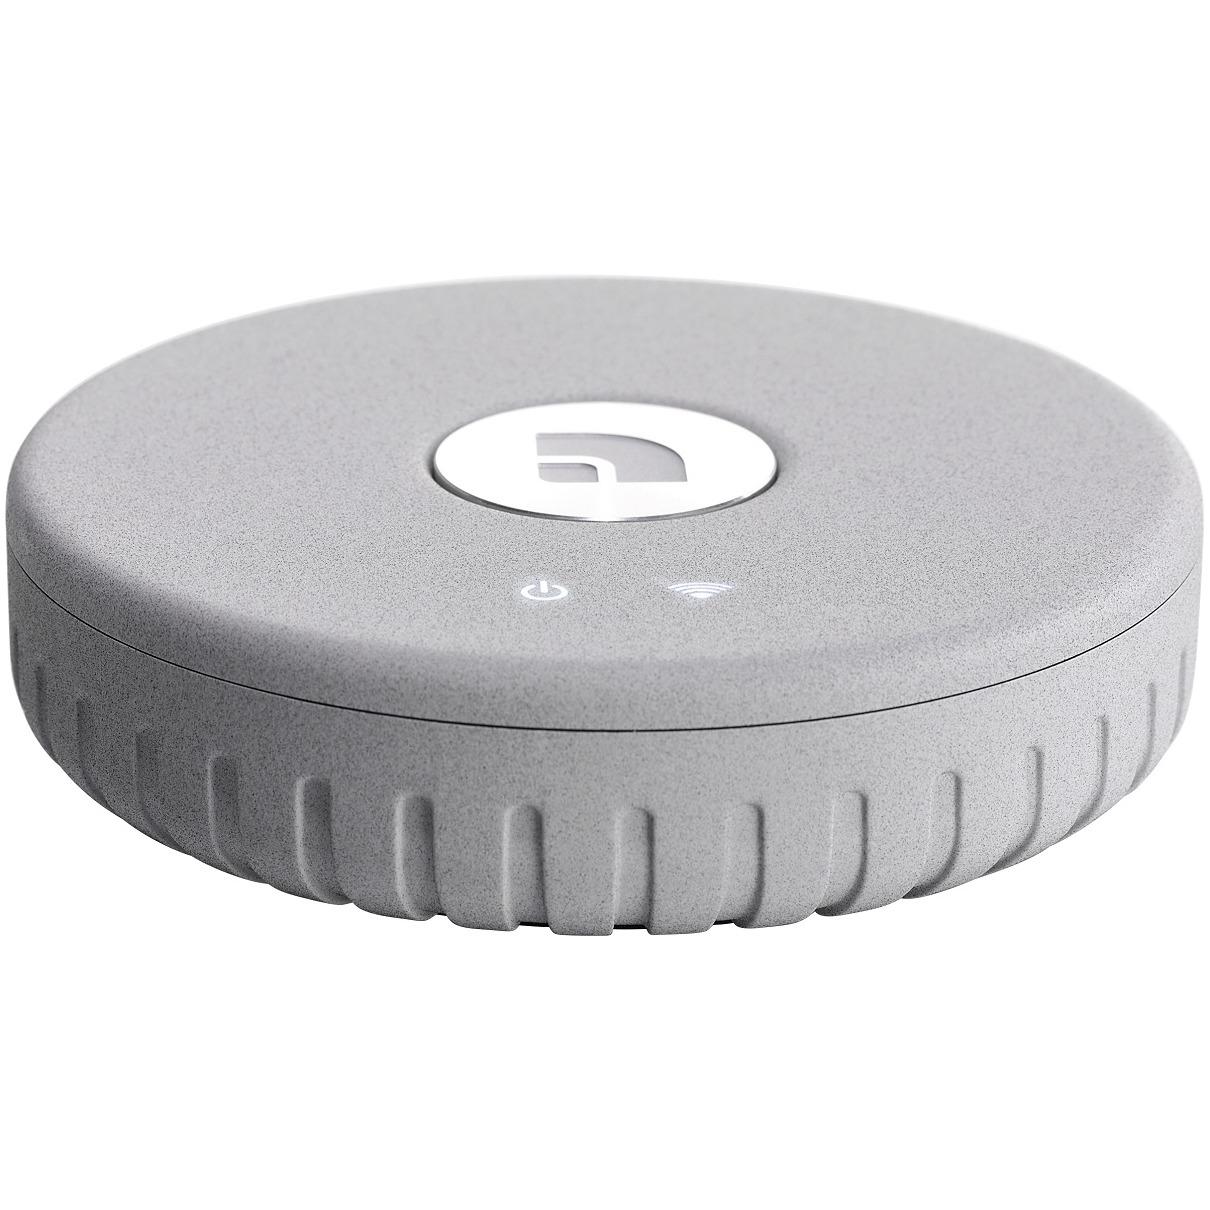 Afbeelding van Audio Pro wifi speaker Link1 Multiroom Wifi Player